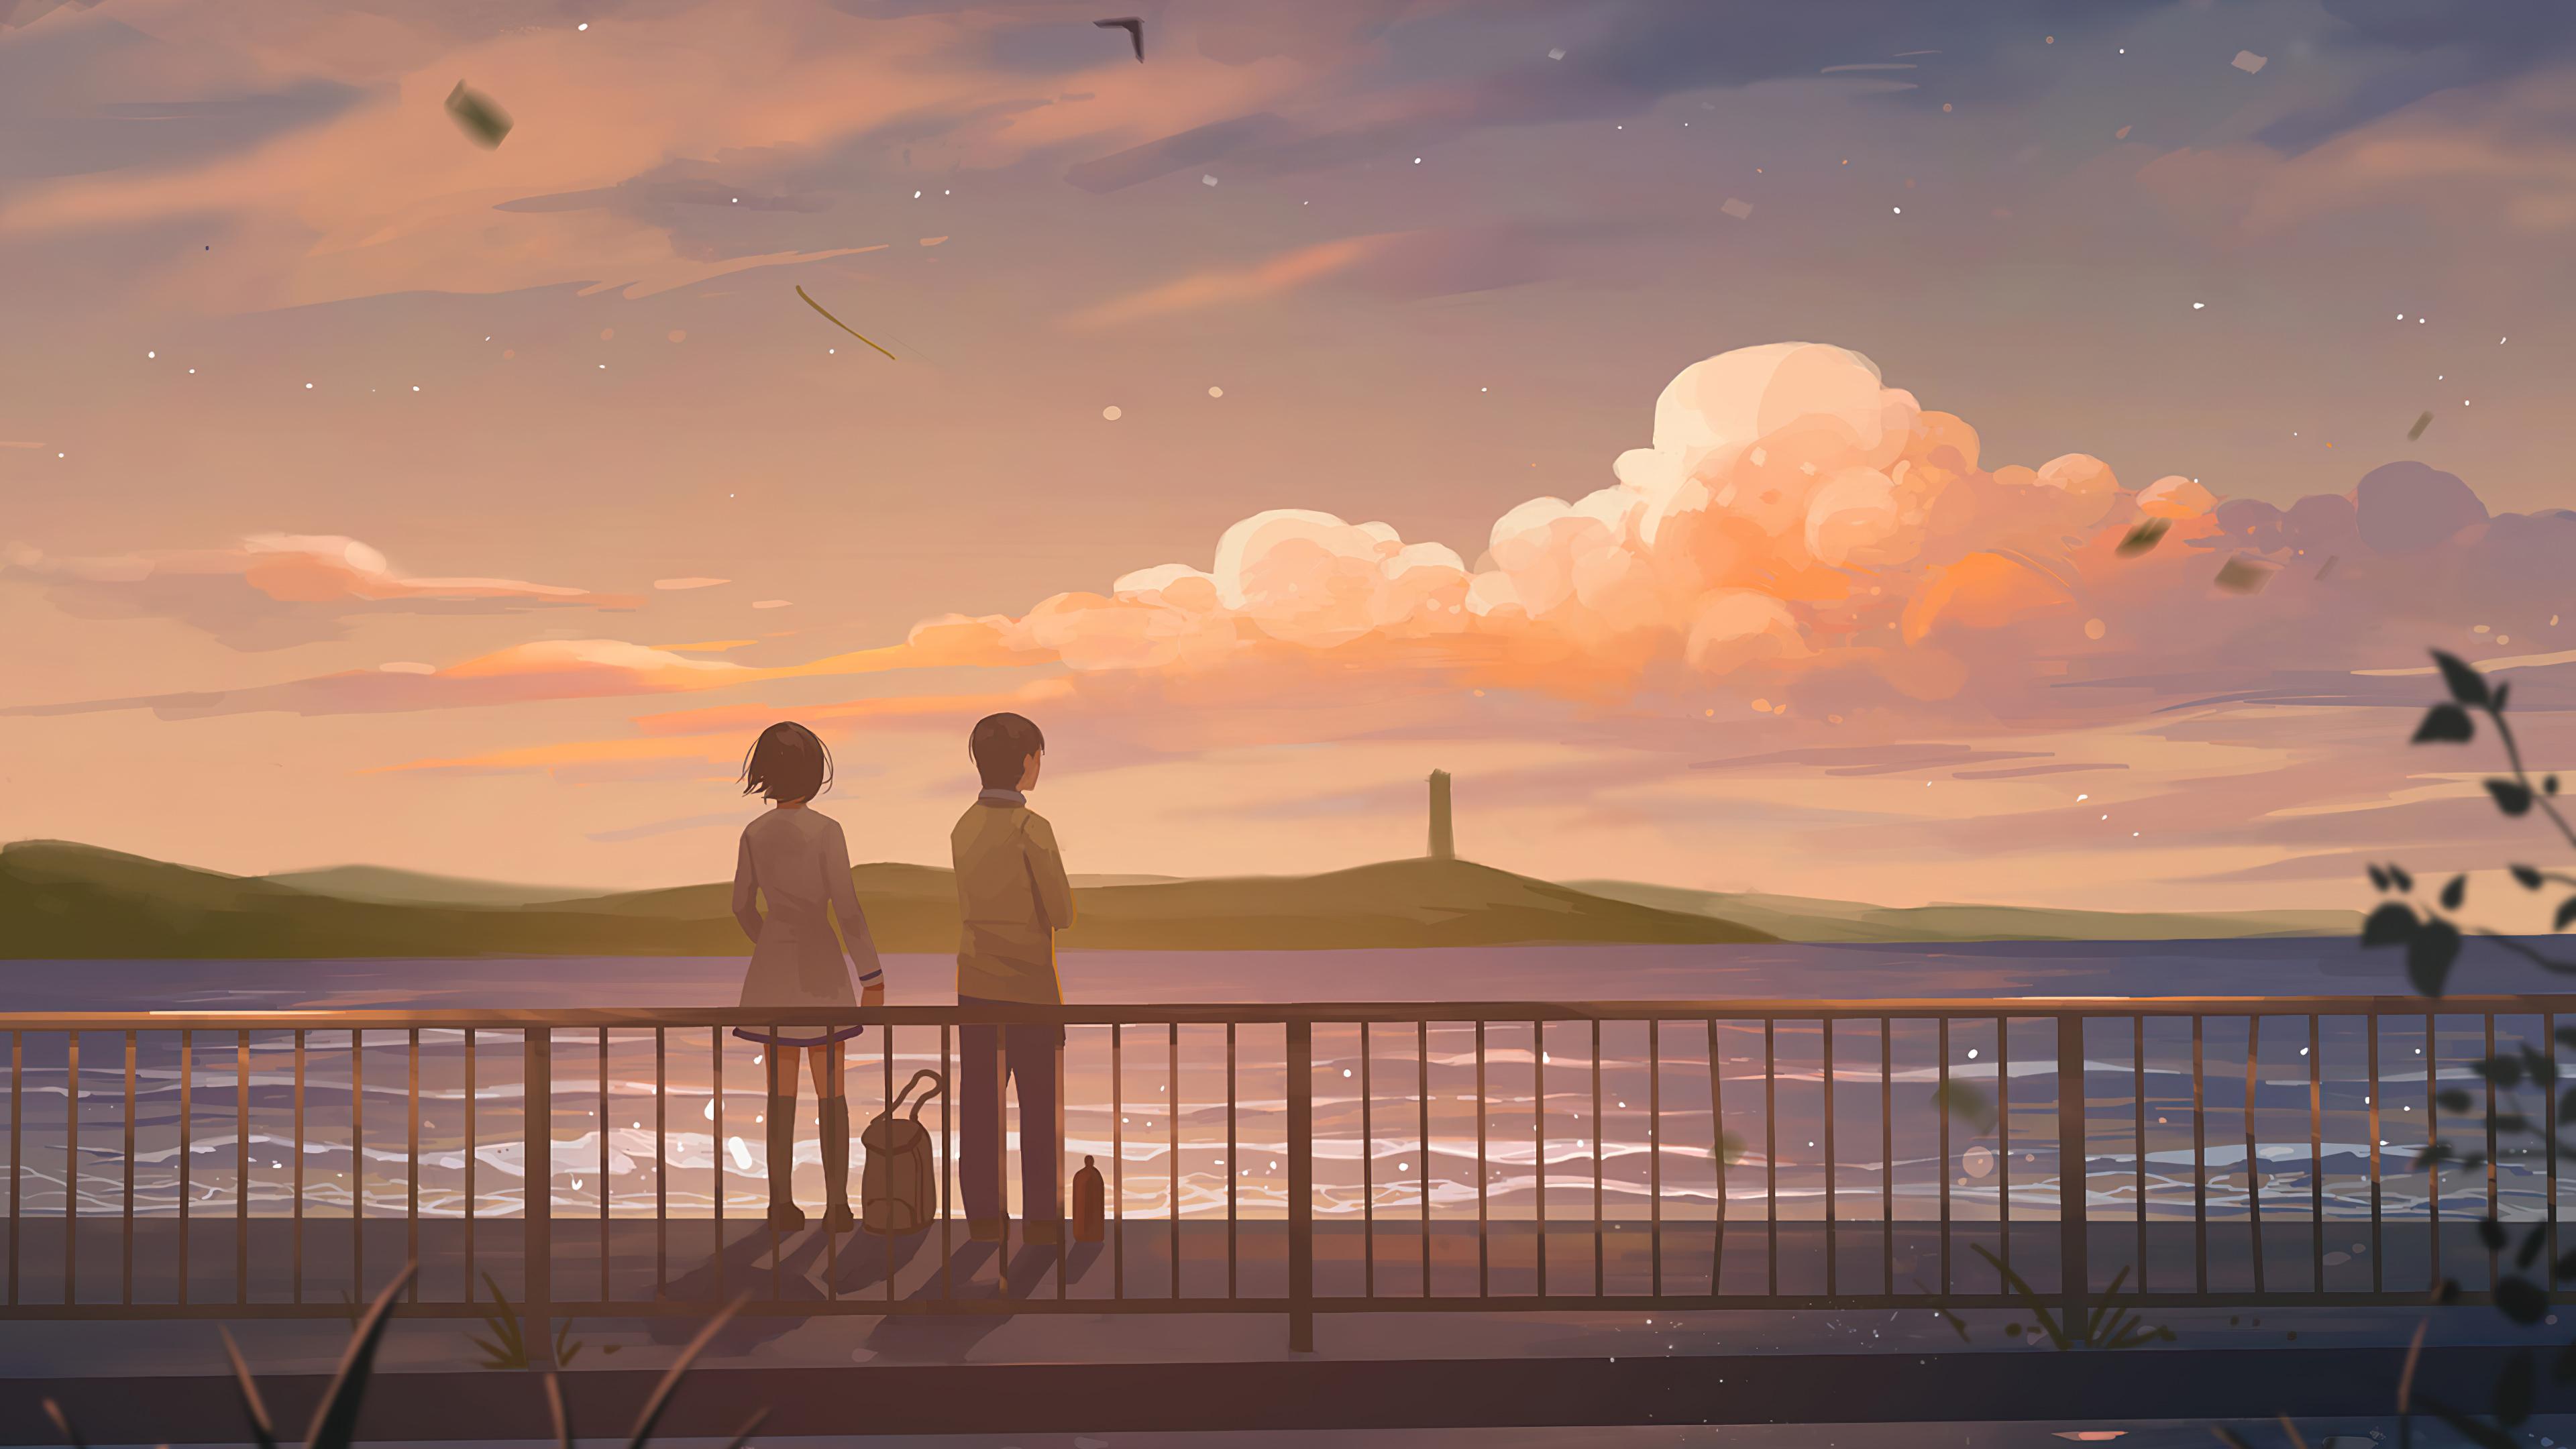 anime couple lets talk 4k qe